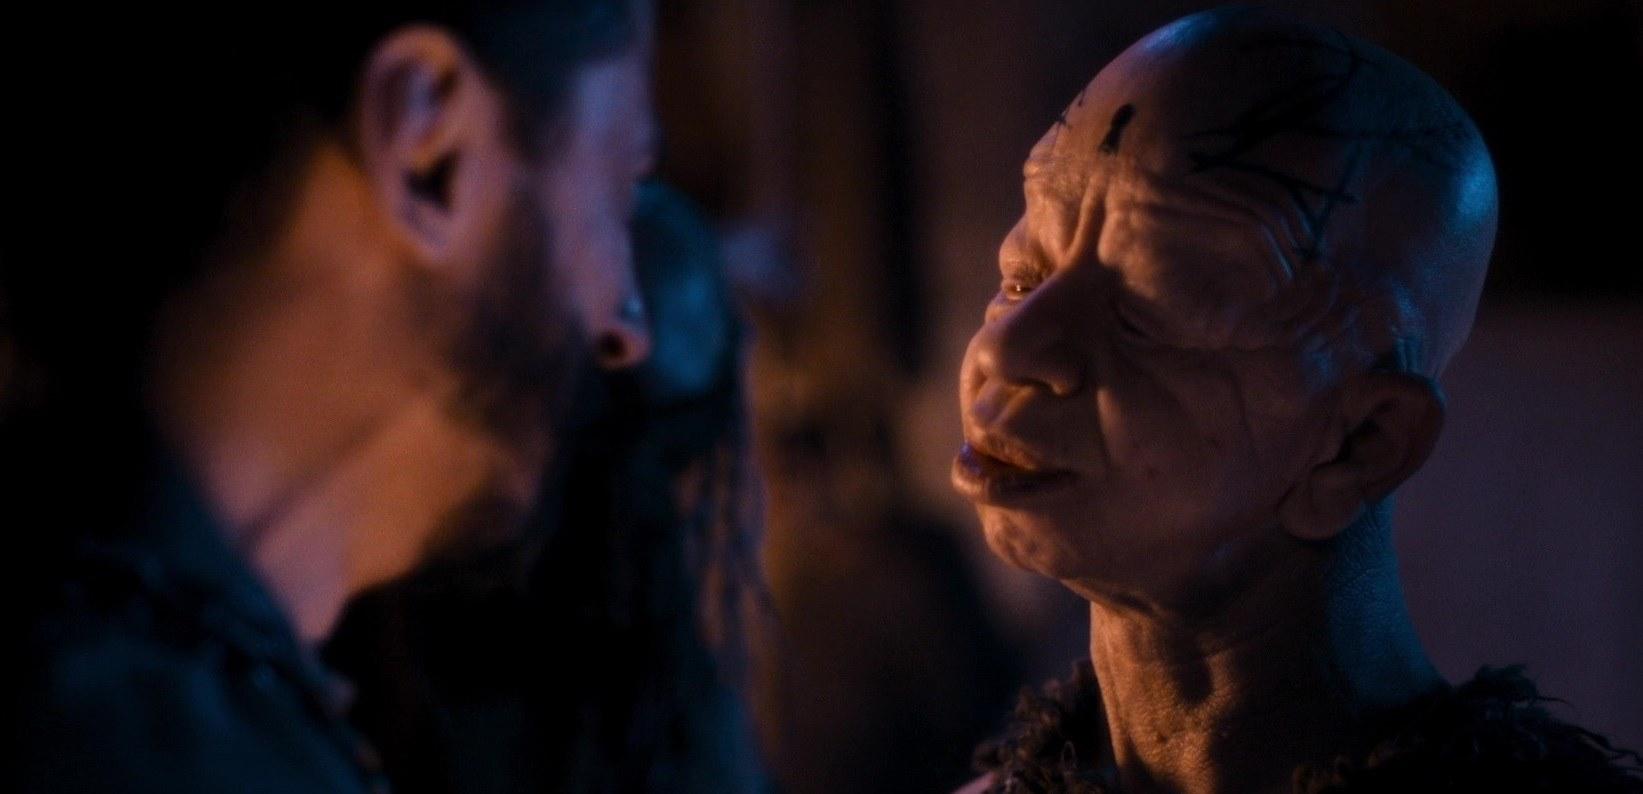 Mehmet Cerrahoglu as Baba The Father in Baskin (2015)